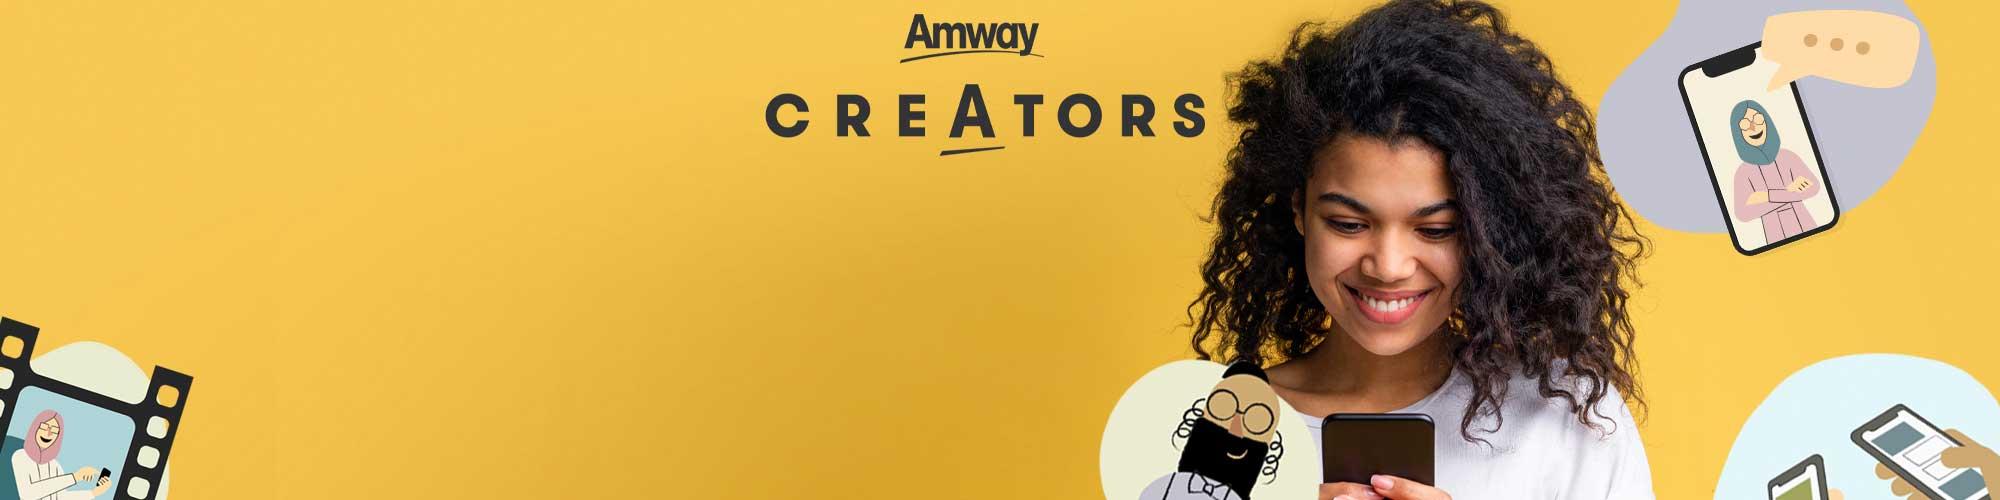 creators-home-page-2-banner-2000-500.jpg